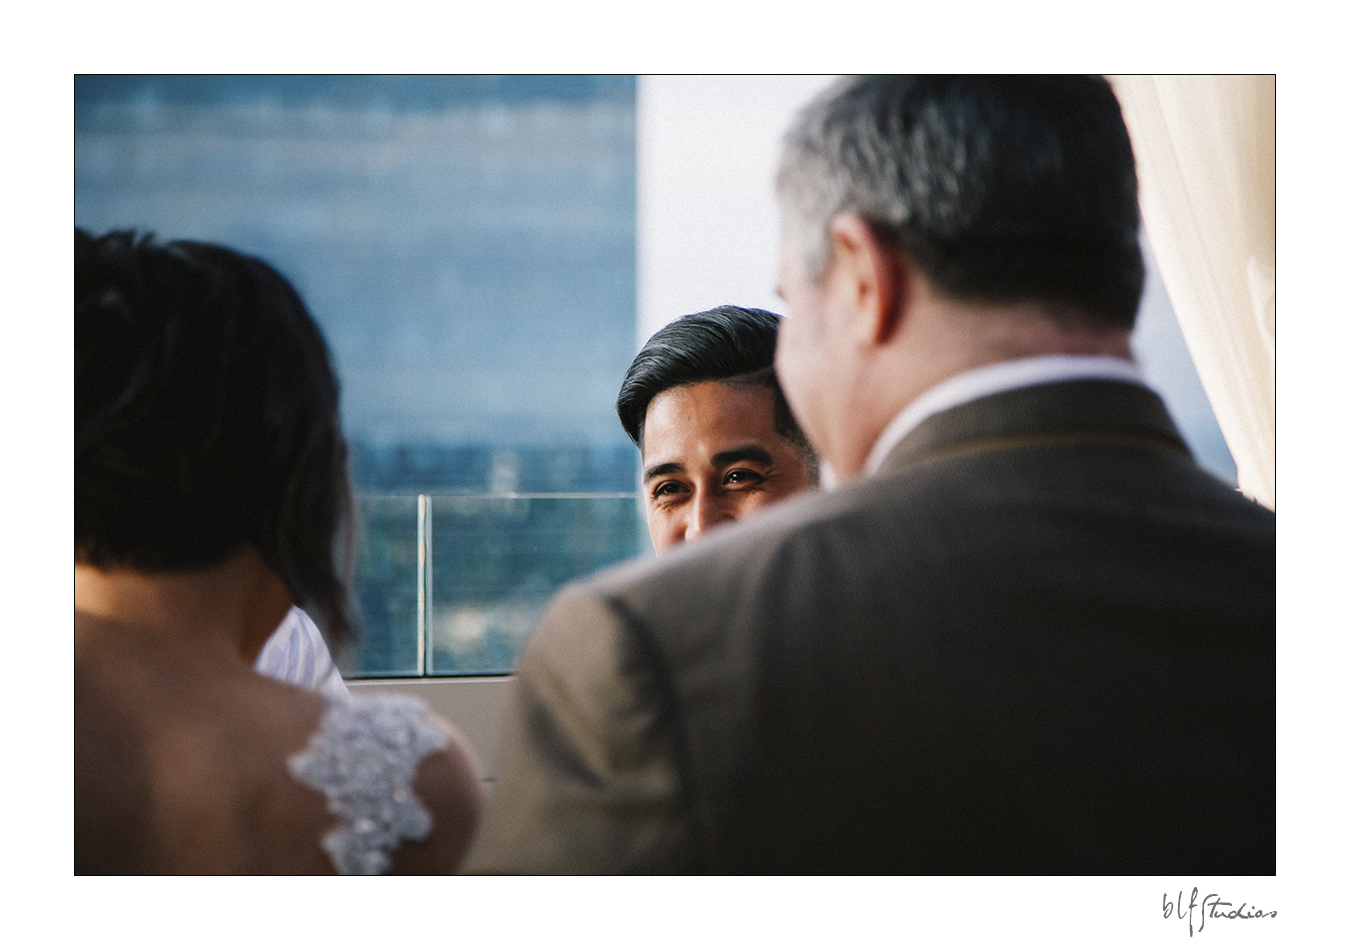 0017-blfstudios-wedding-photographer-daniel-danielle-atlanta.jpg